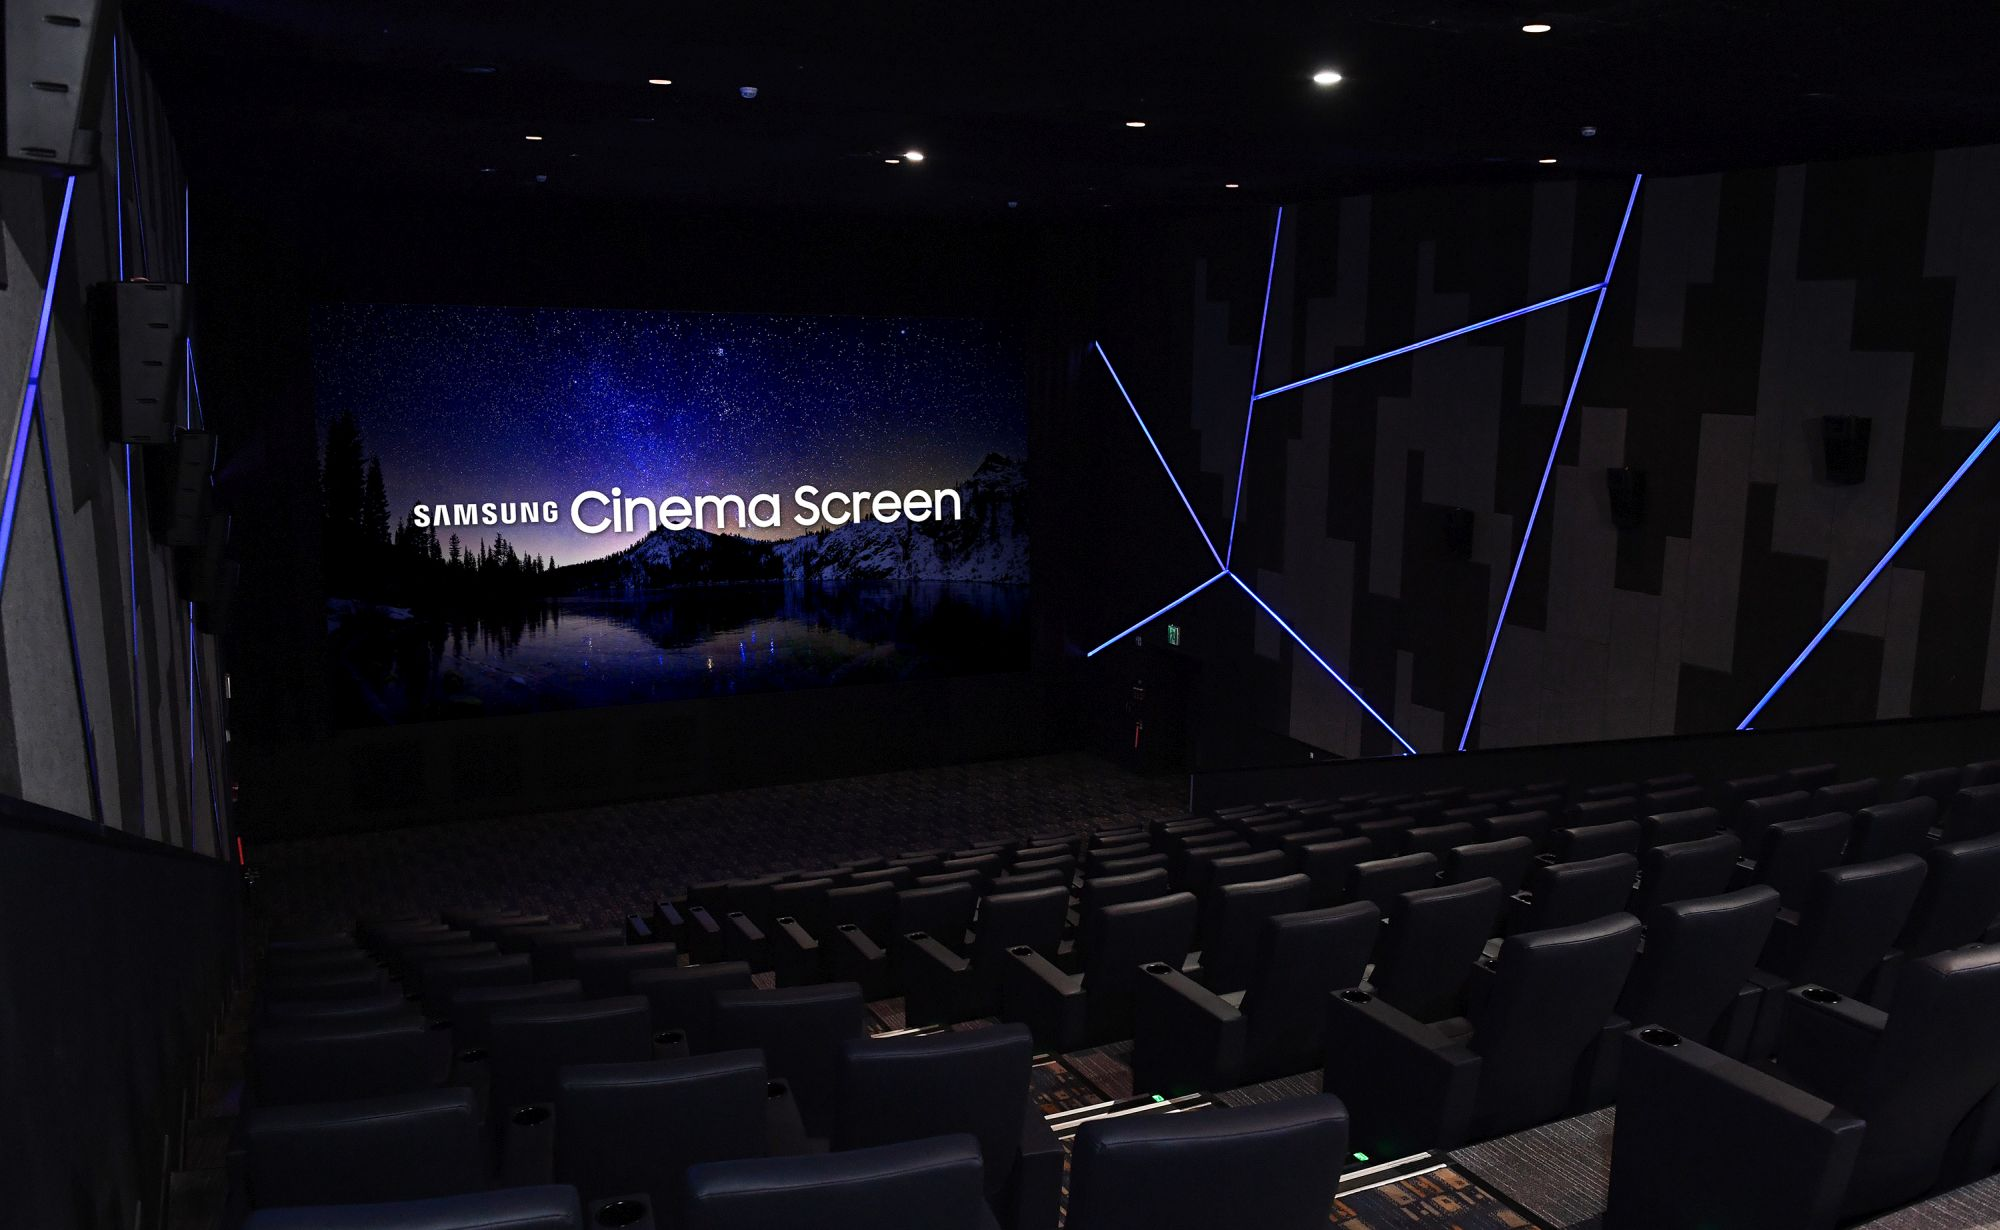 Cinema-LED-Screen-Photo-for-Global-Press-Release-4